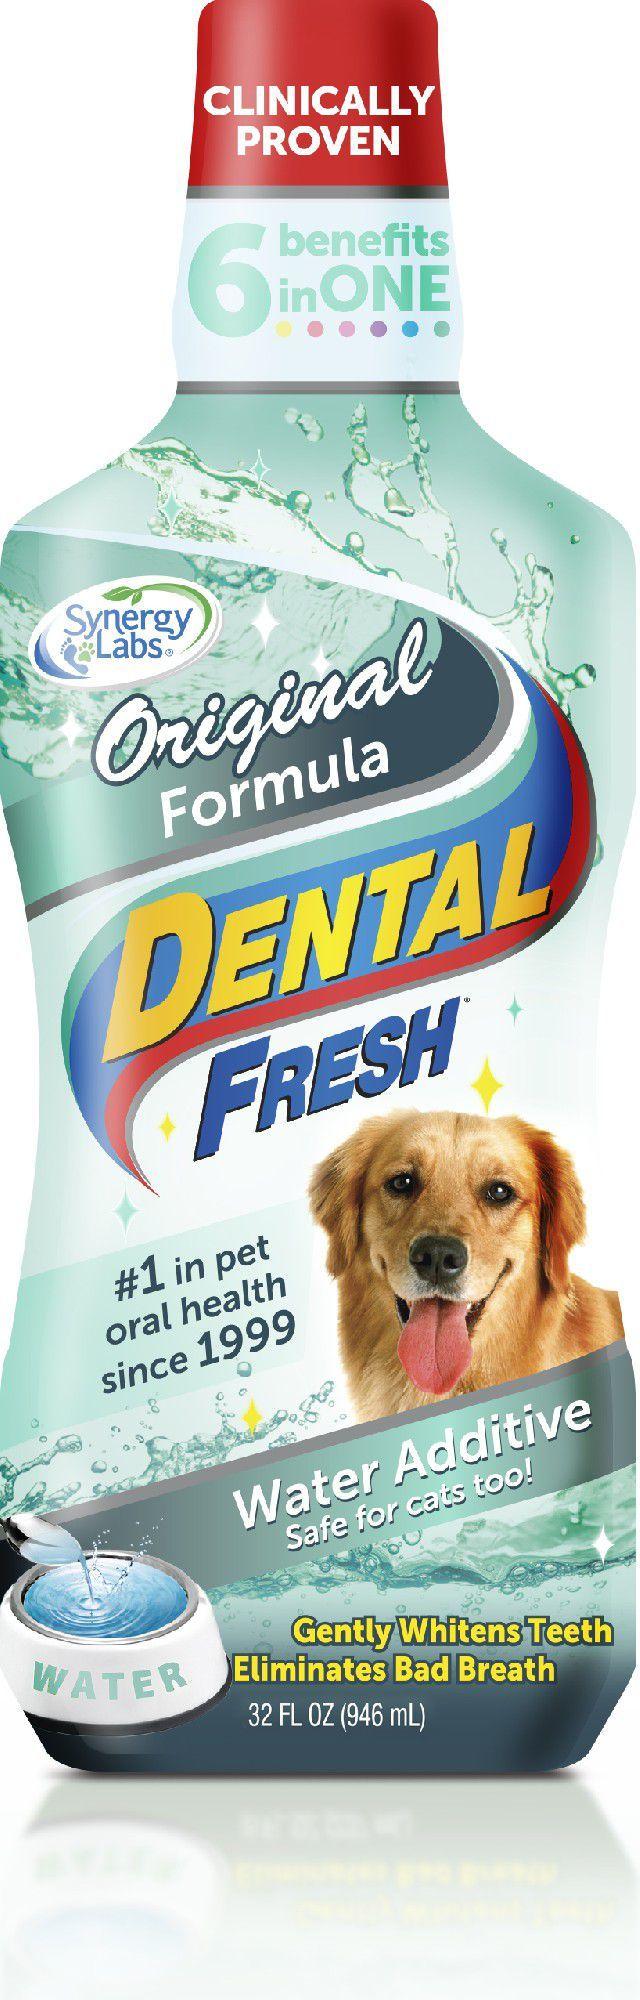 Synergy Labs Dental Fresh standard 503ml 1